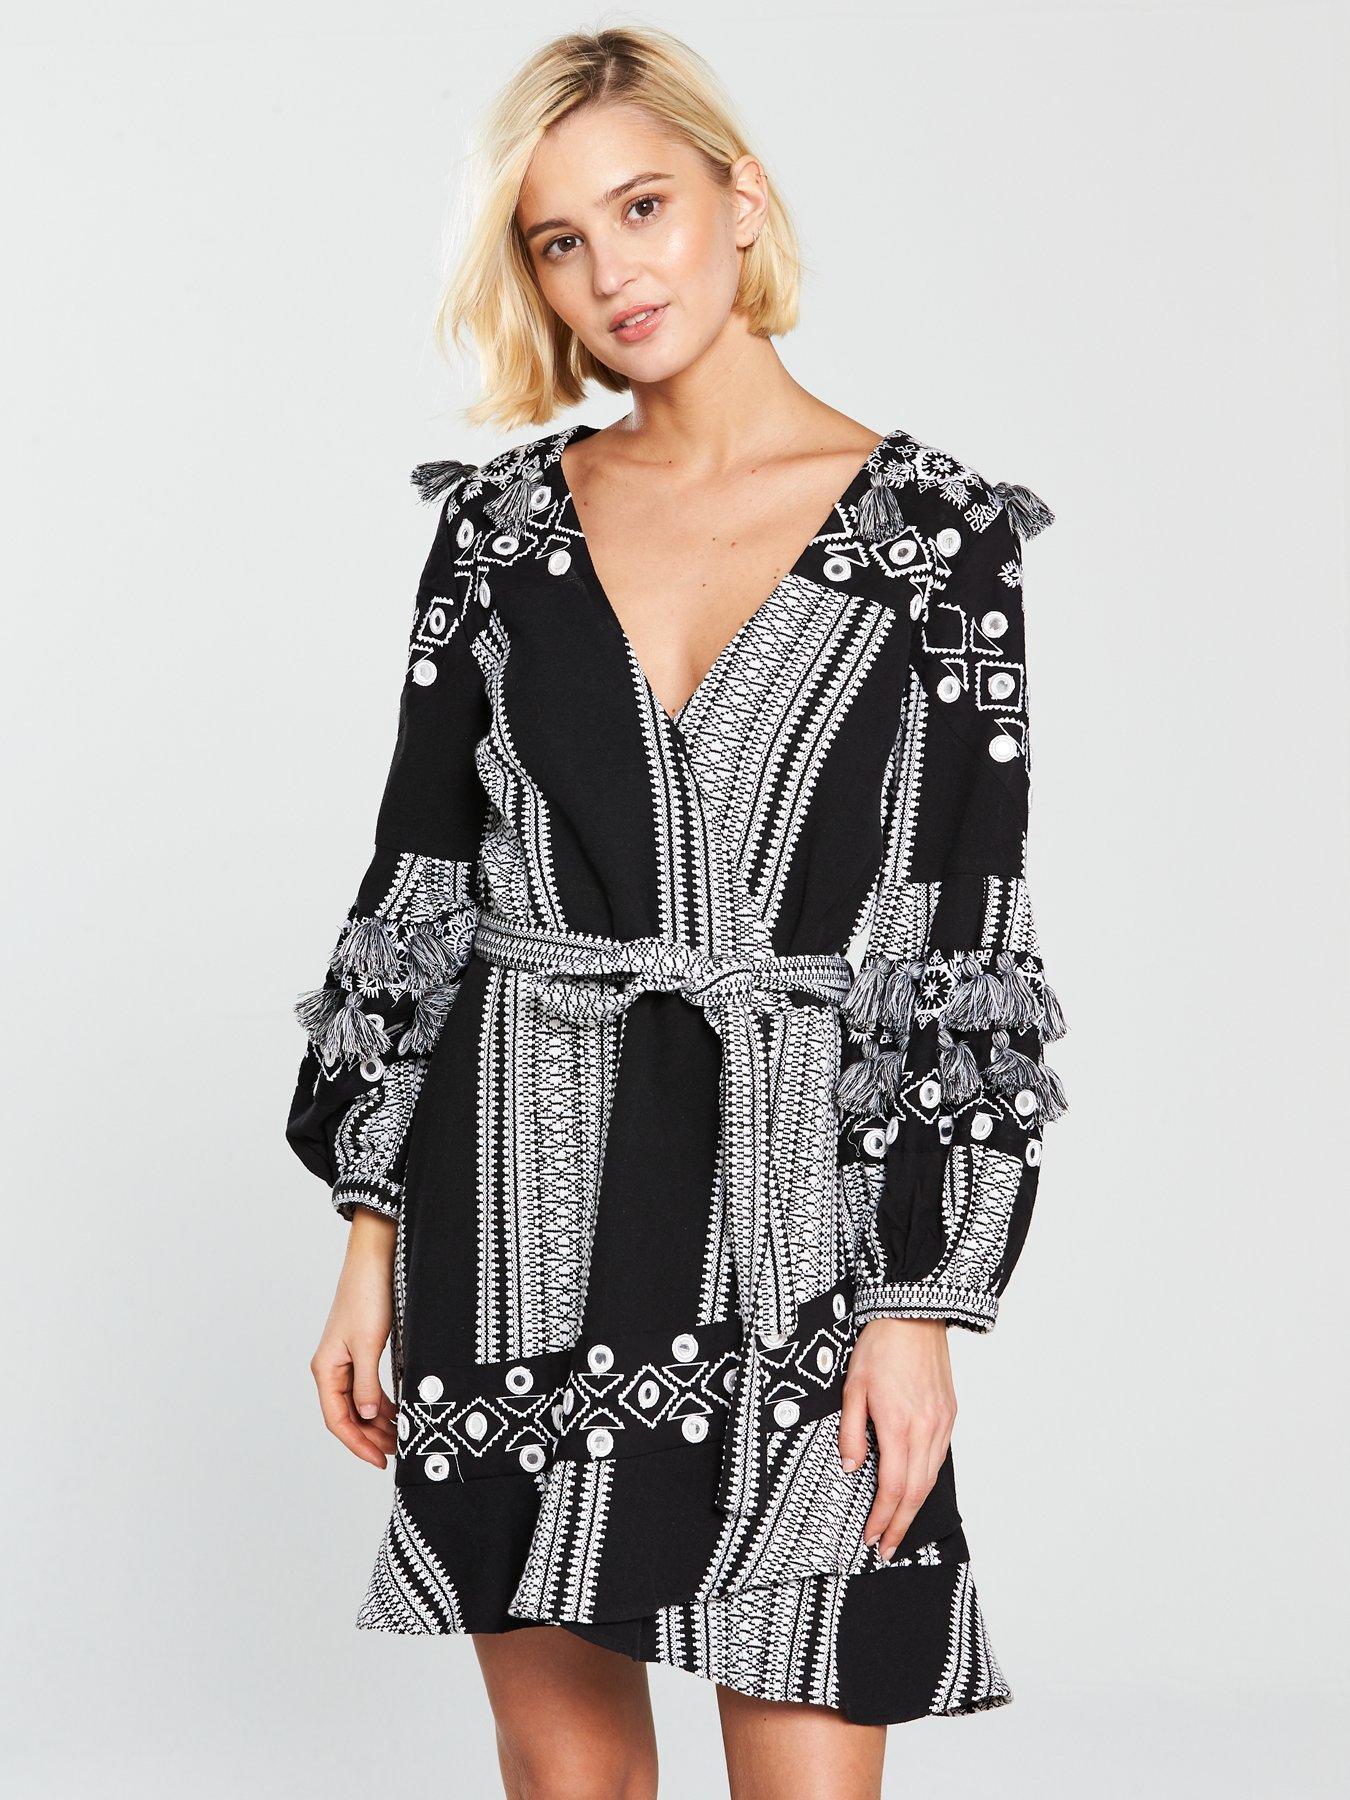 Karen millen black lace dress ebay